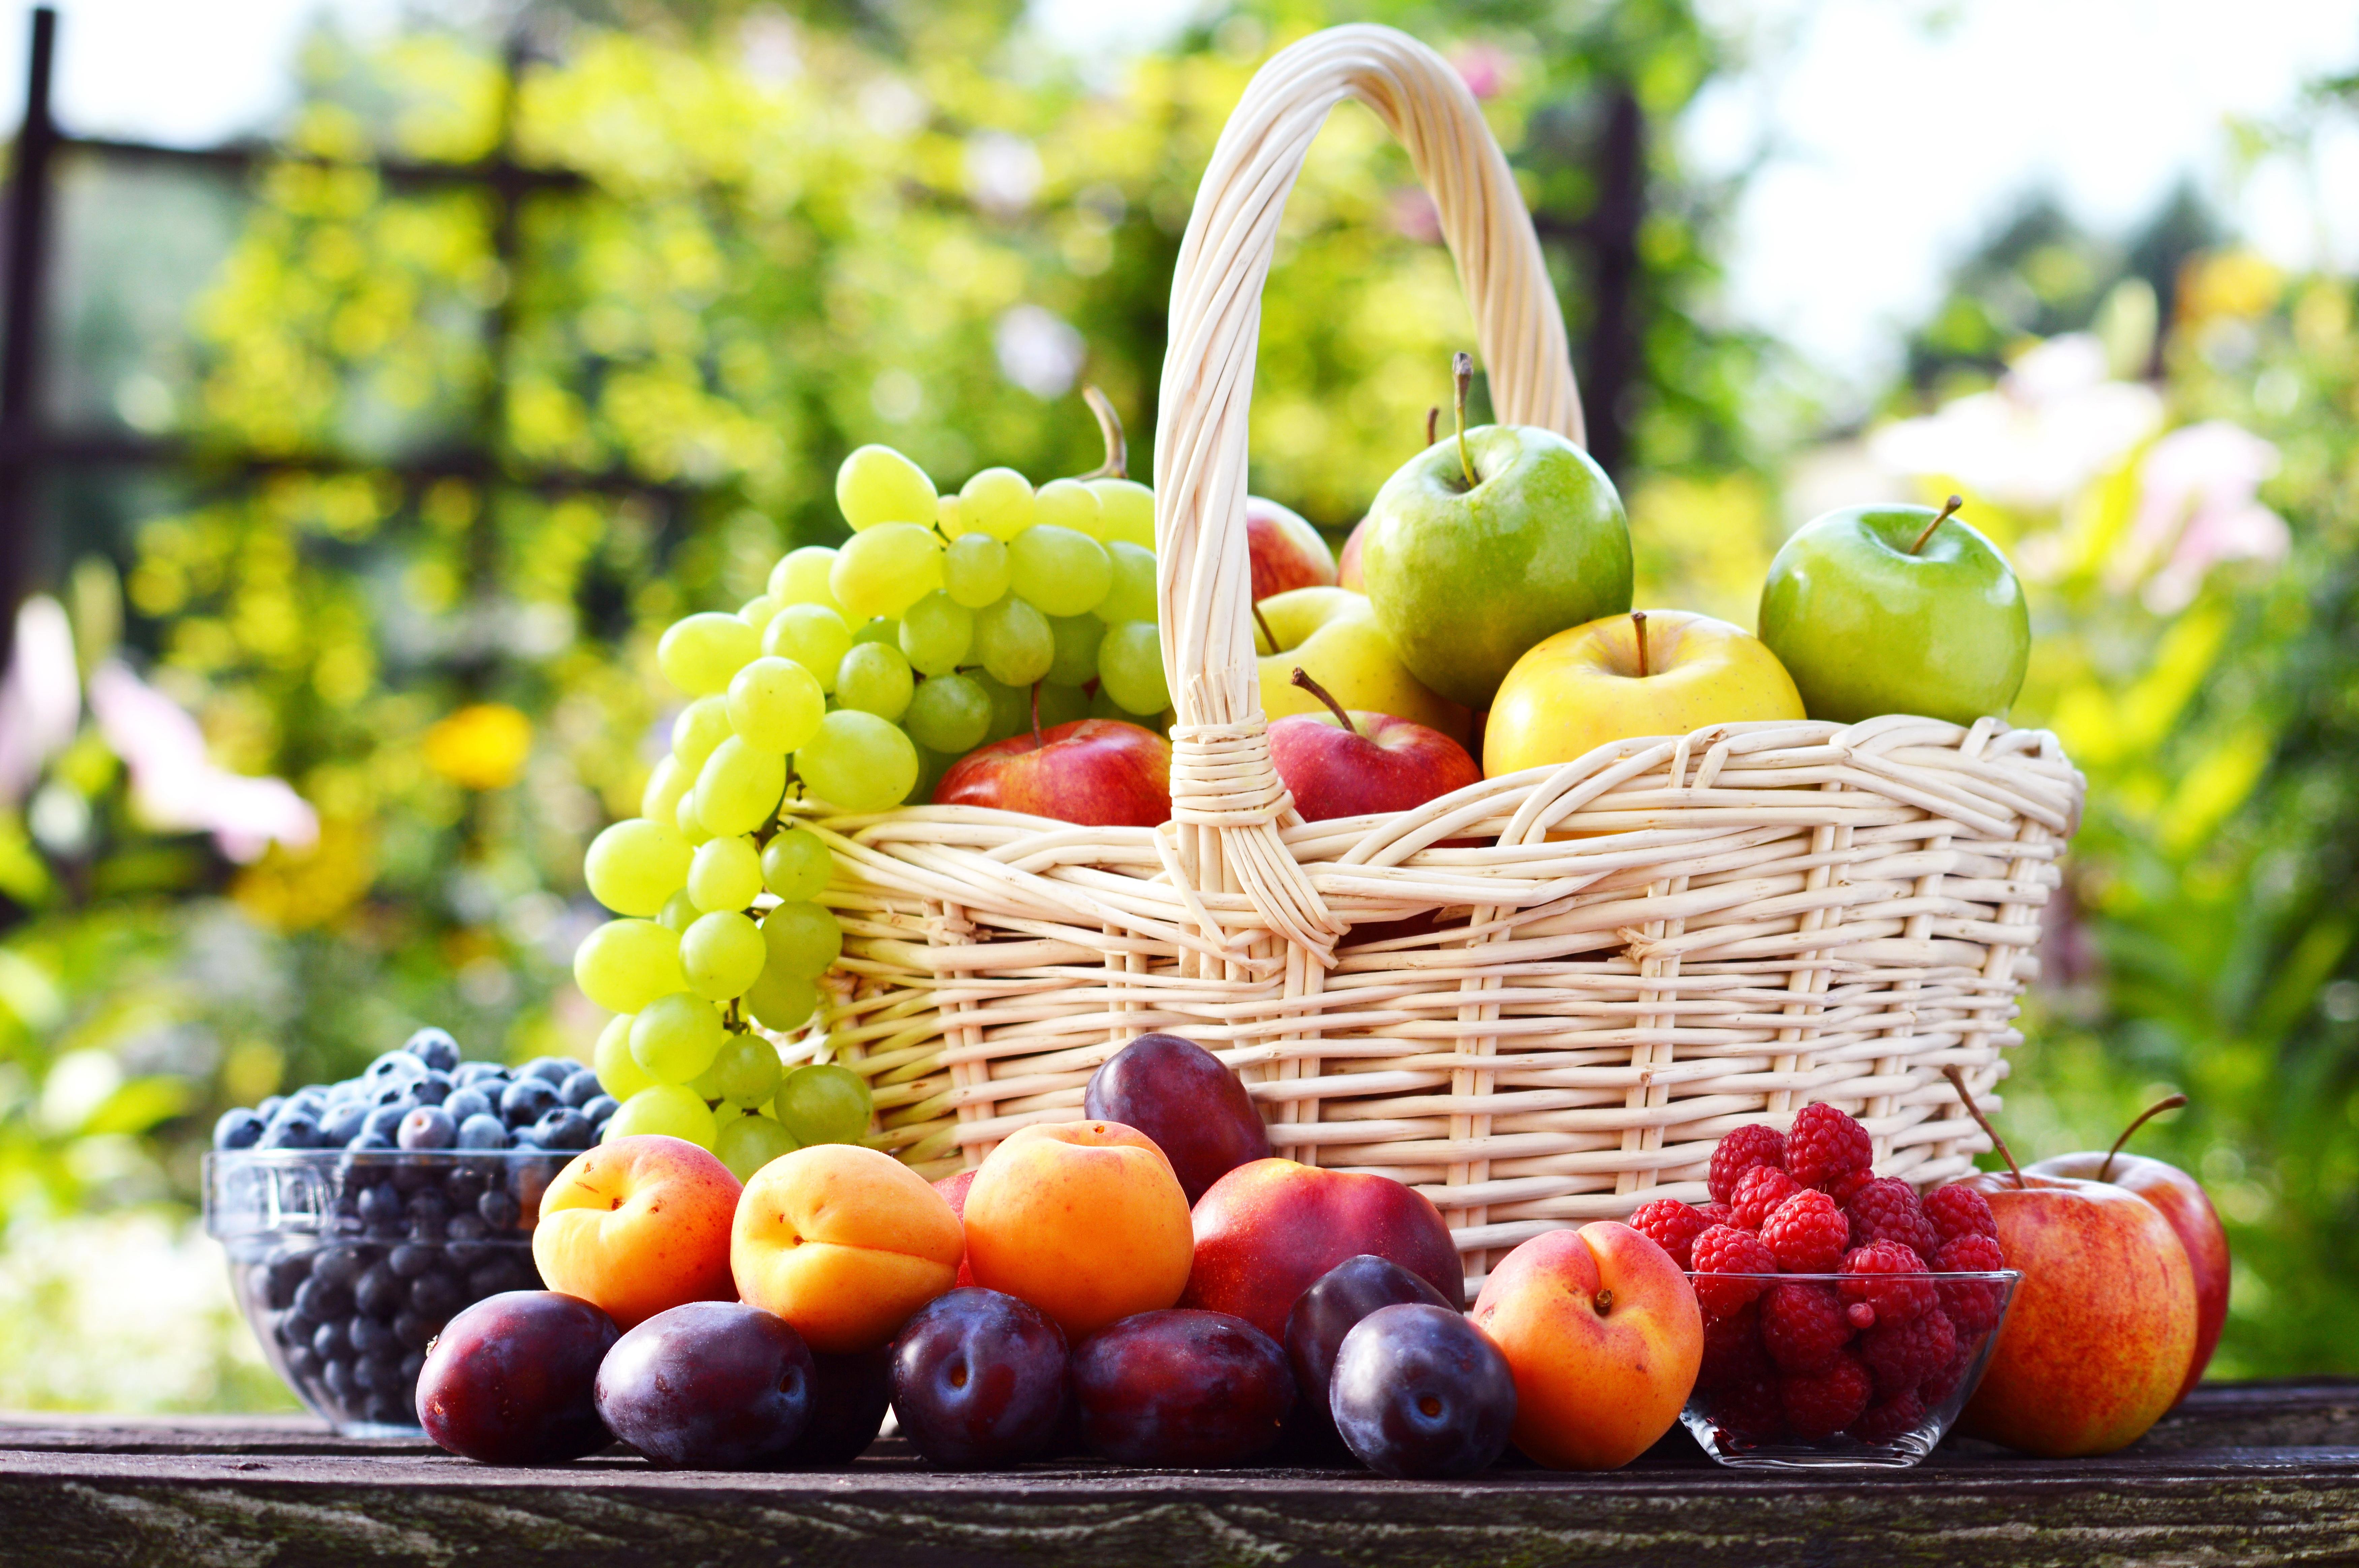 Виноград в корзине бесплатно